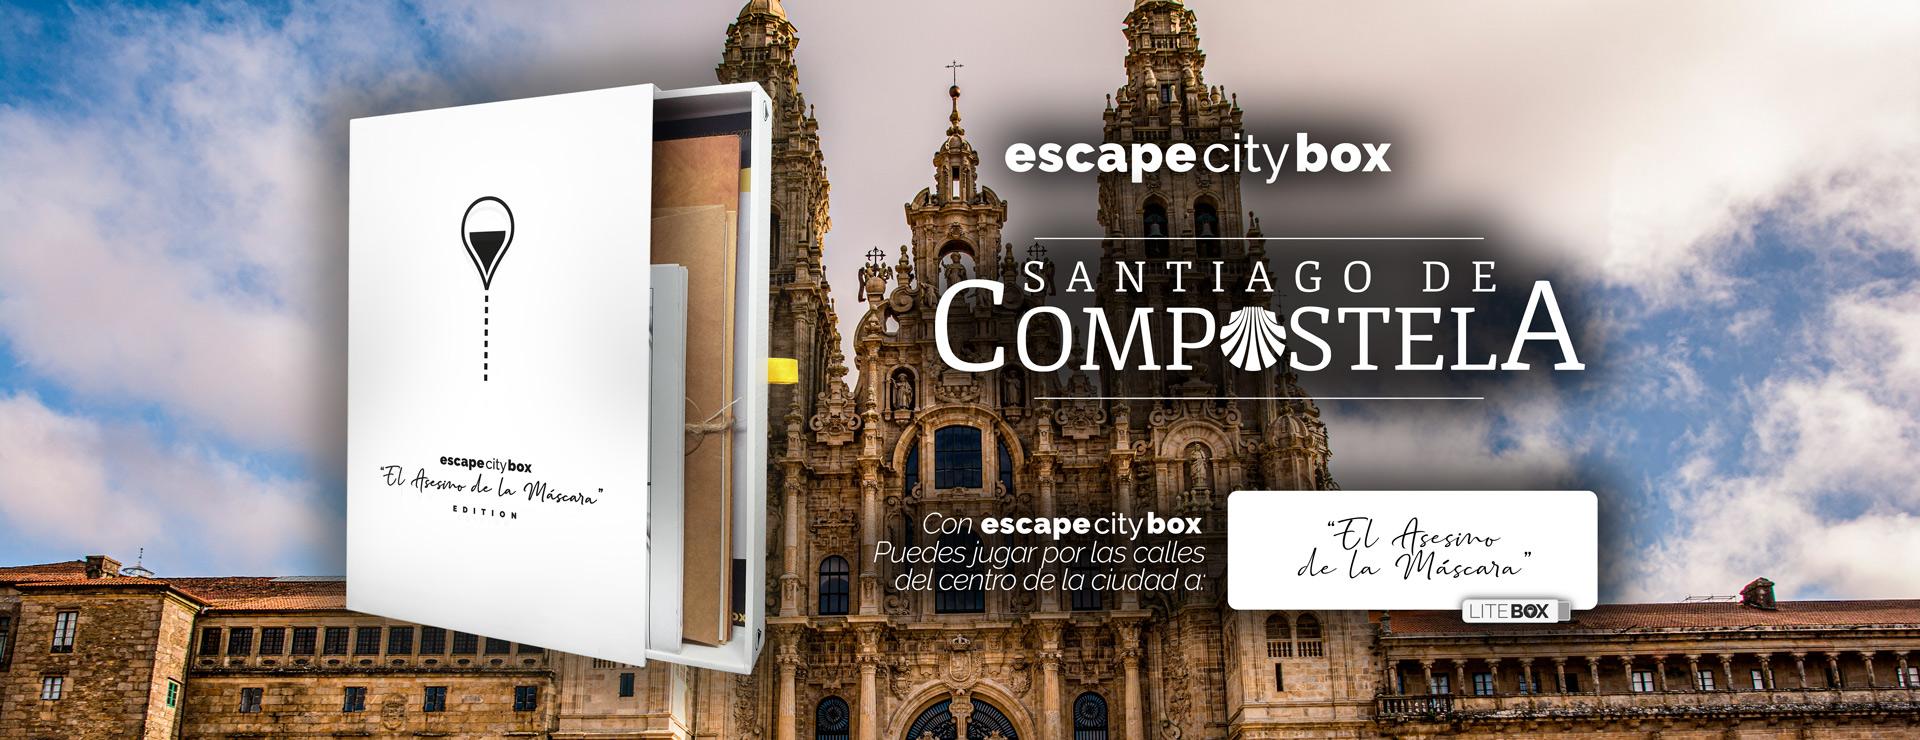 City Escape en Santiago de compostela